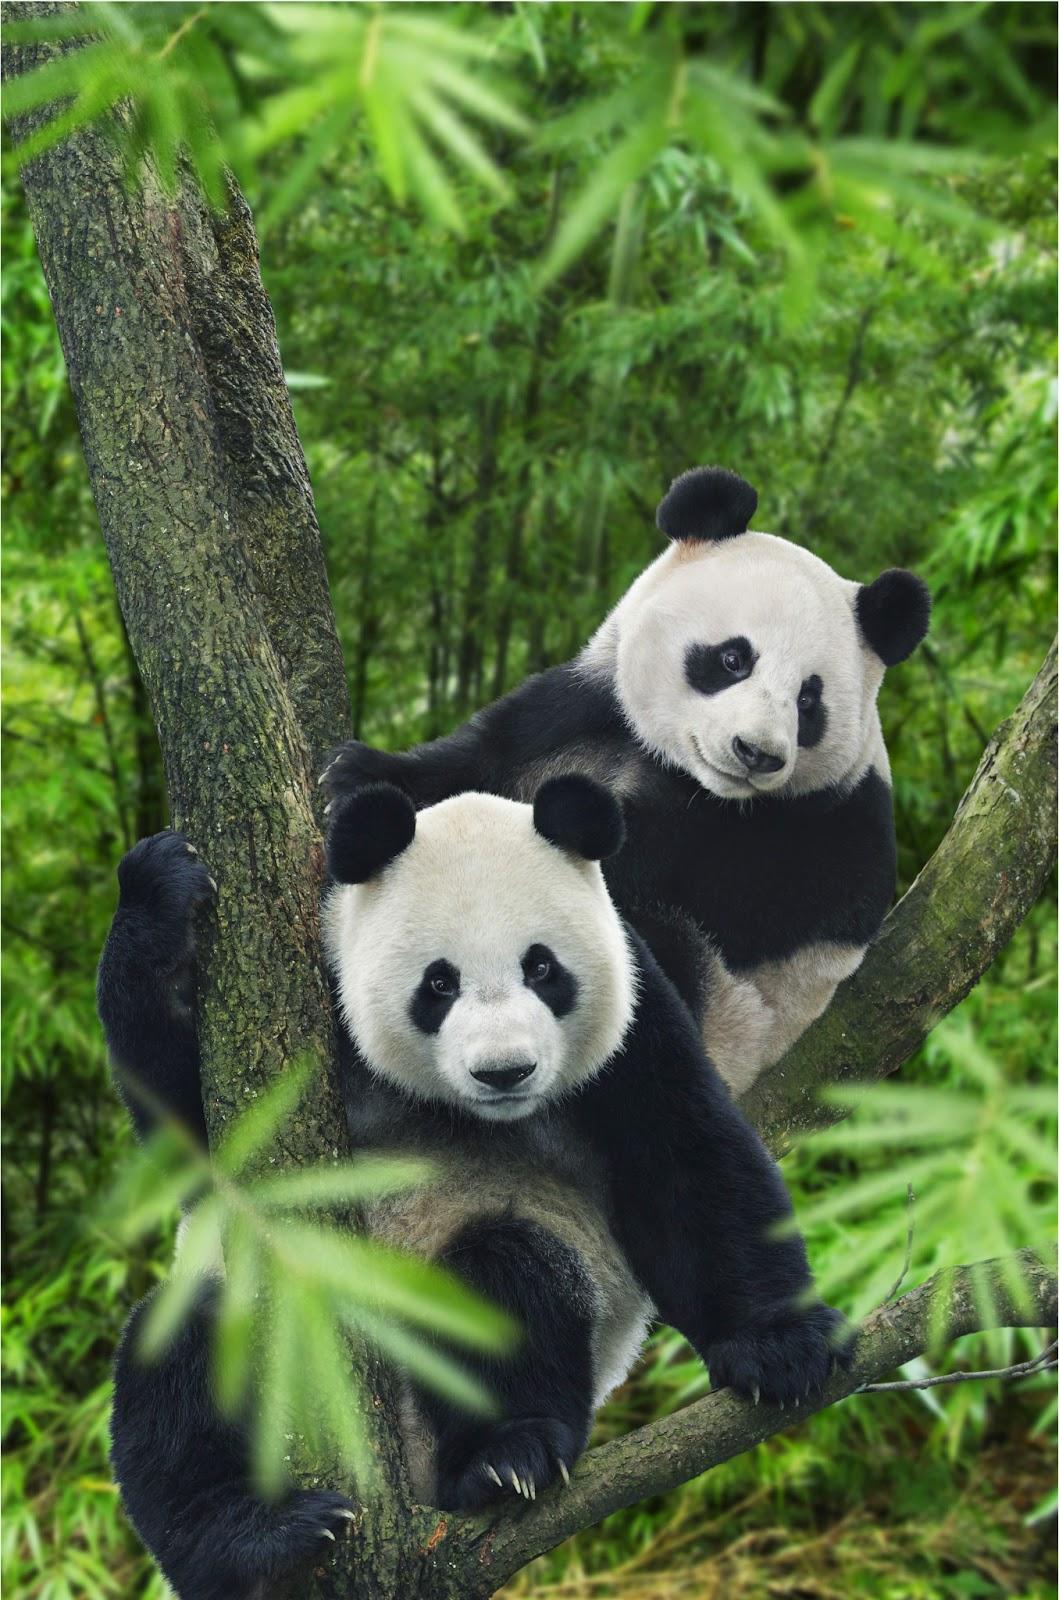 Panda Kai Kai Dan Jia Jia Baru Saja Merayakan Ulang Tahun